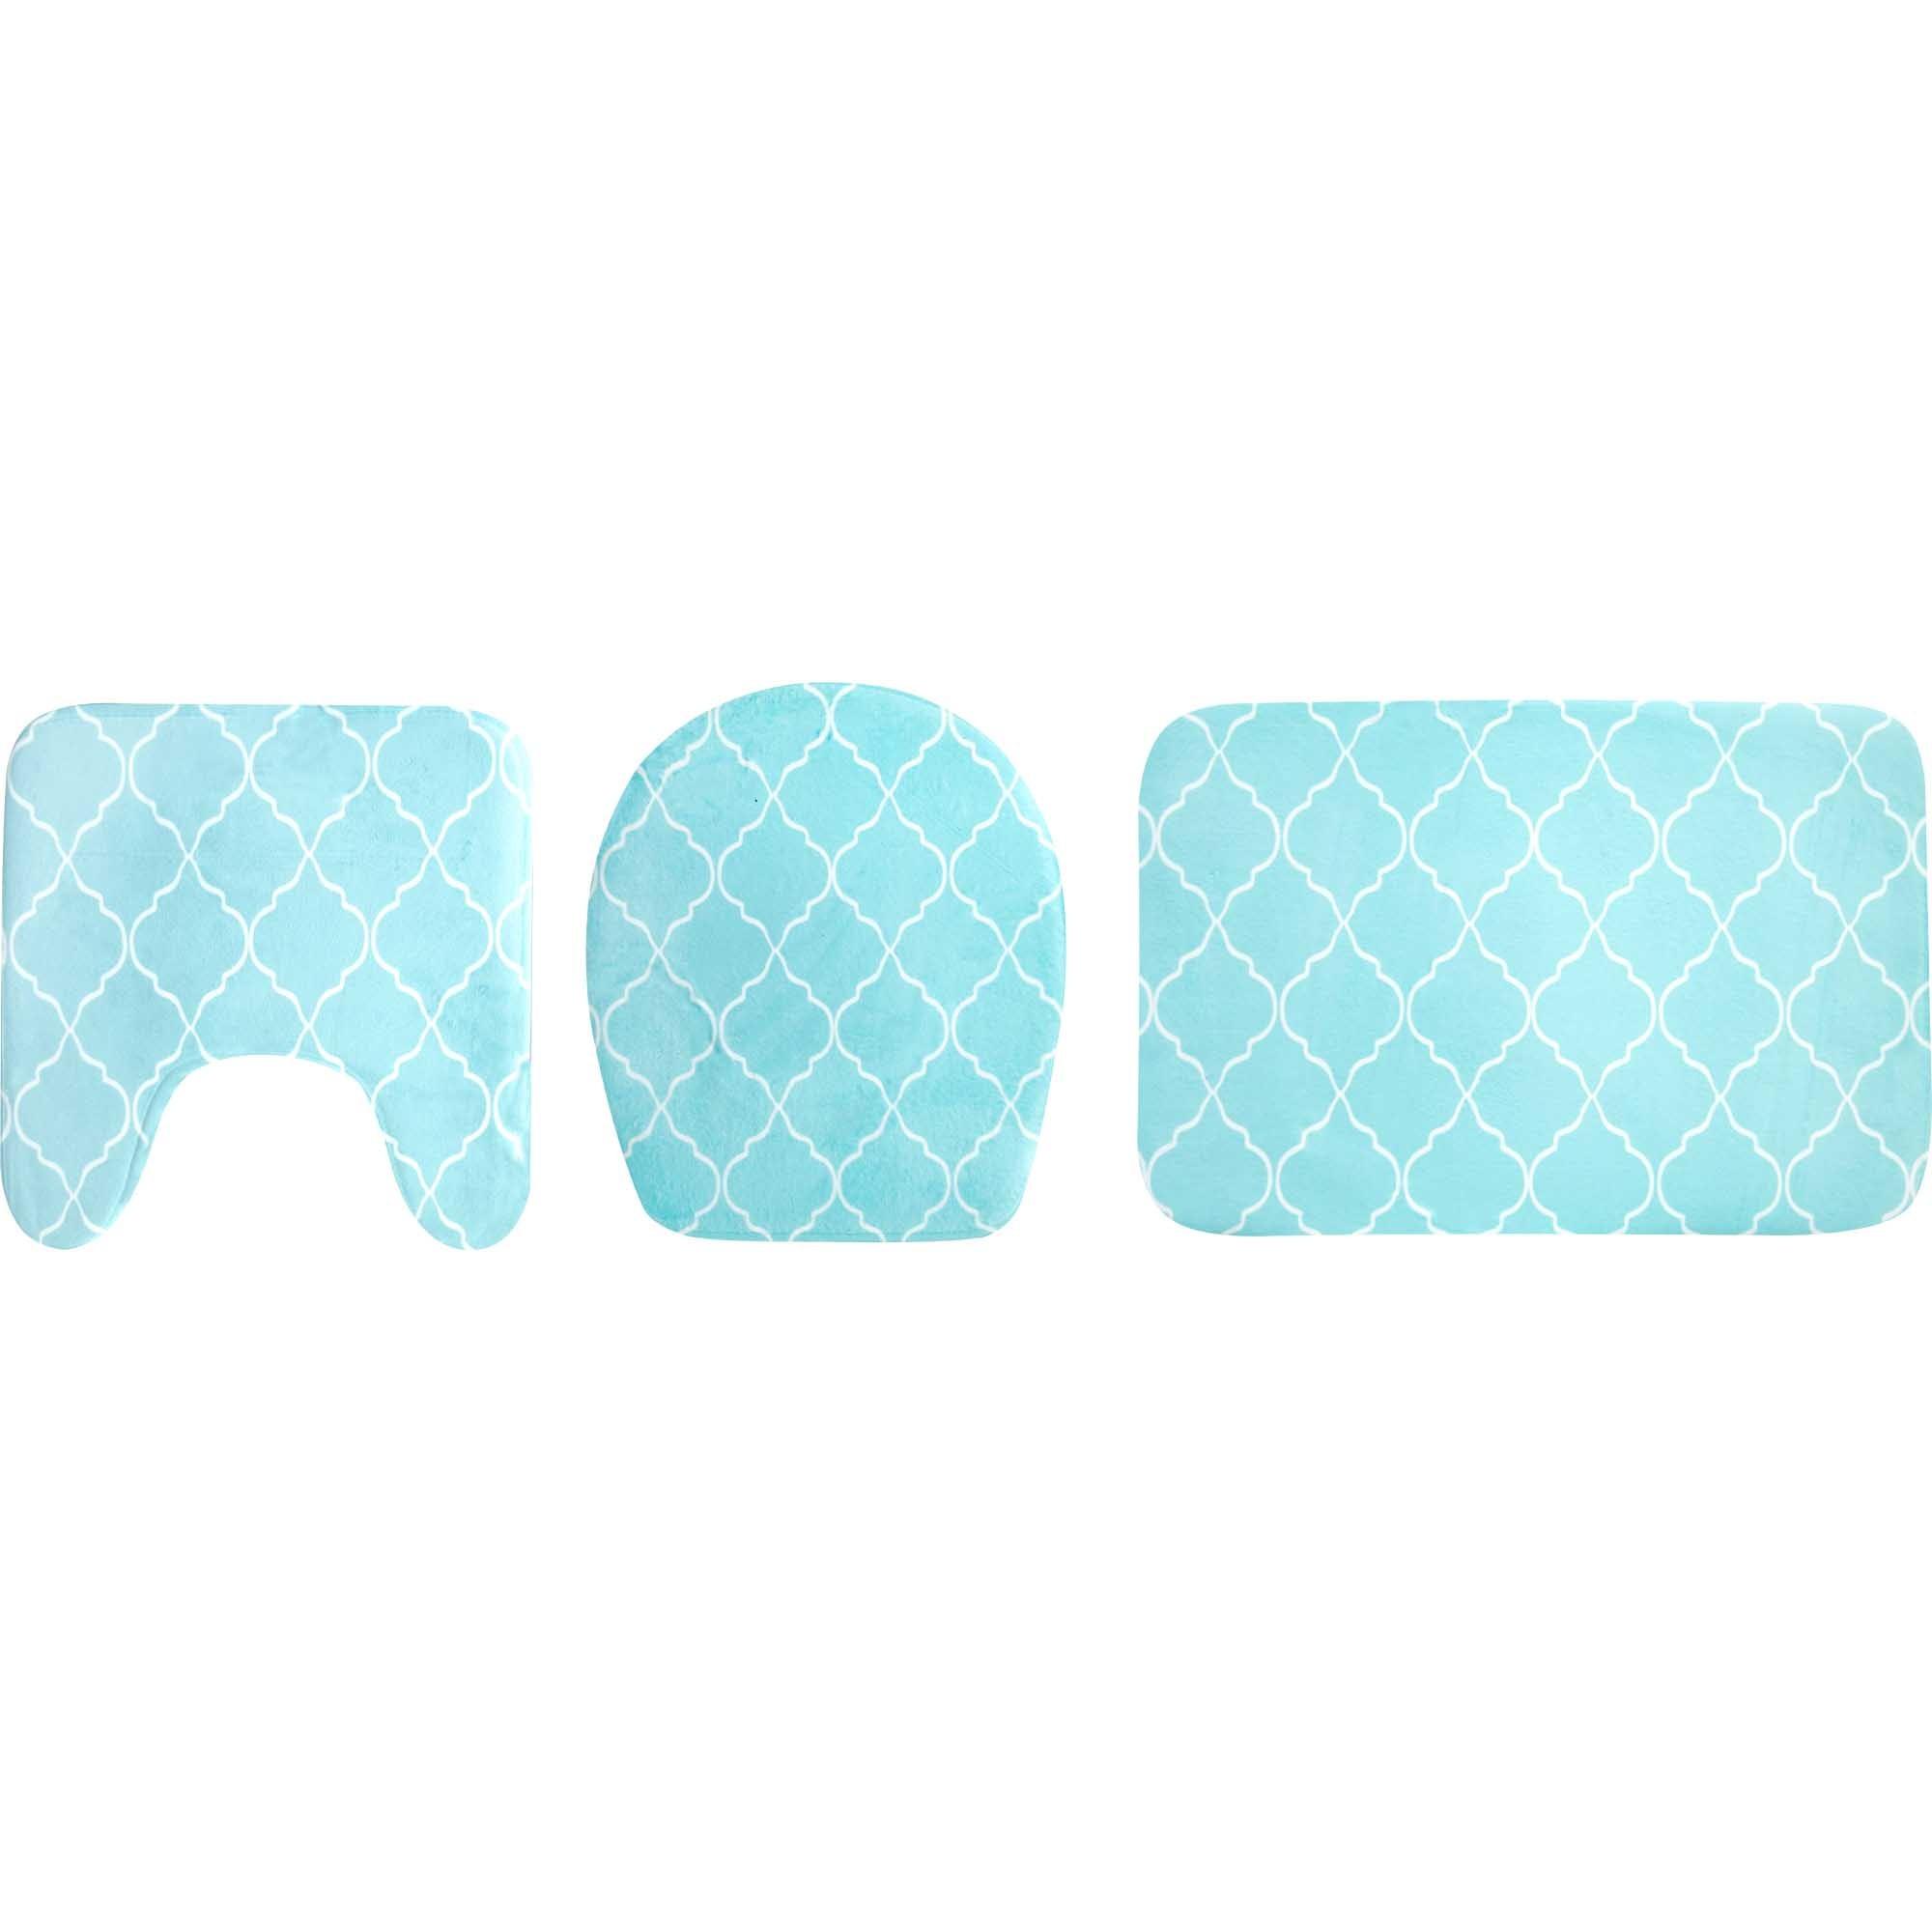 Kit 3 Peças Para Banheiro Geométrico - Yin's Home